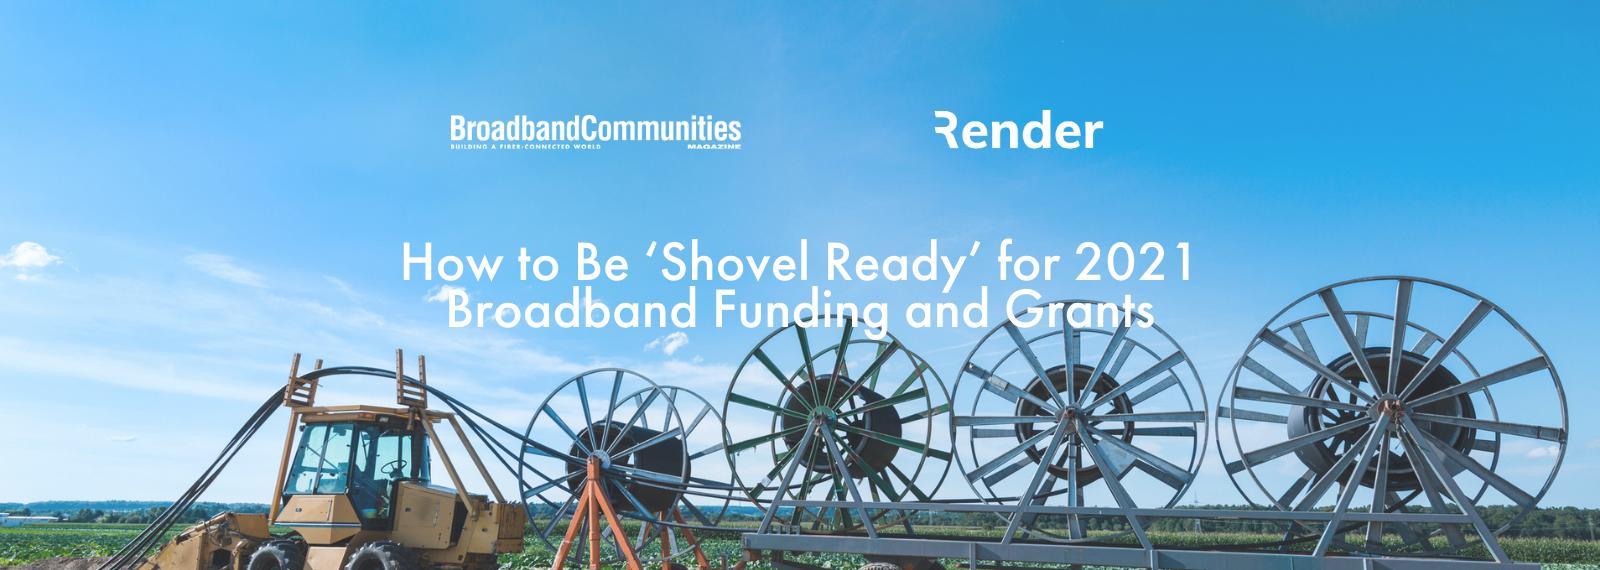 Render BBC Shovel Ready (1)